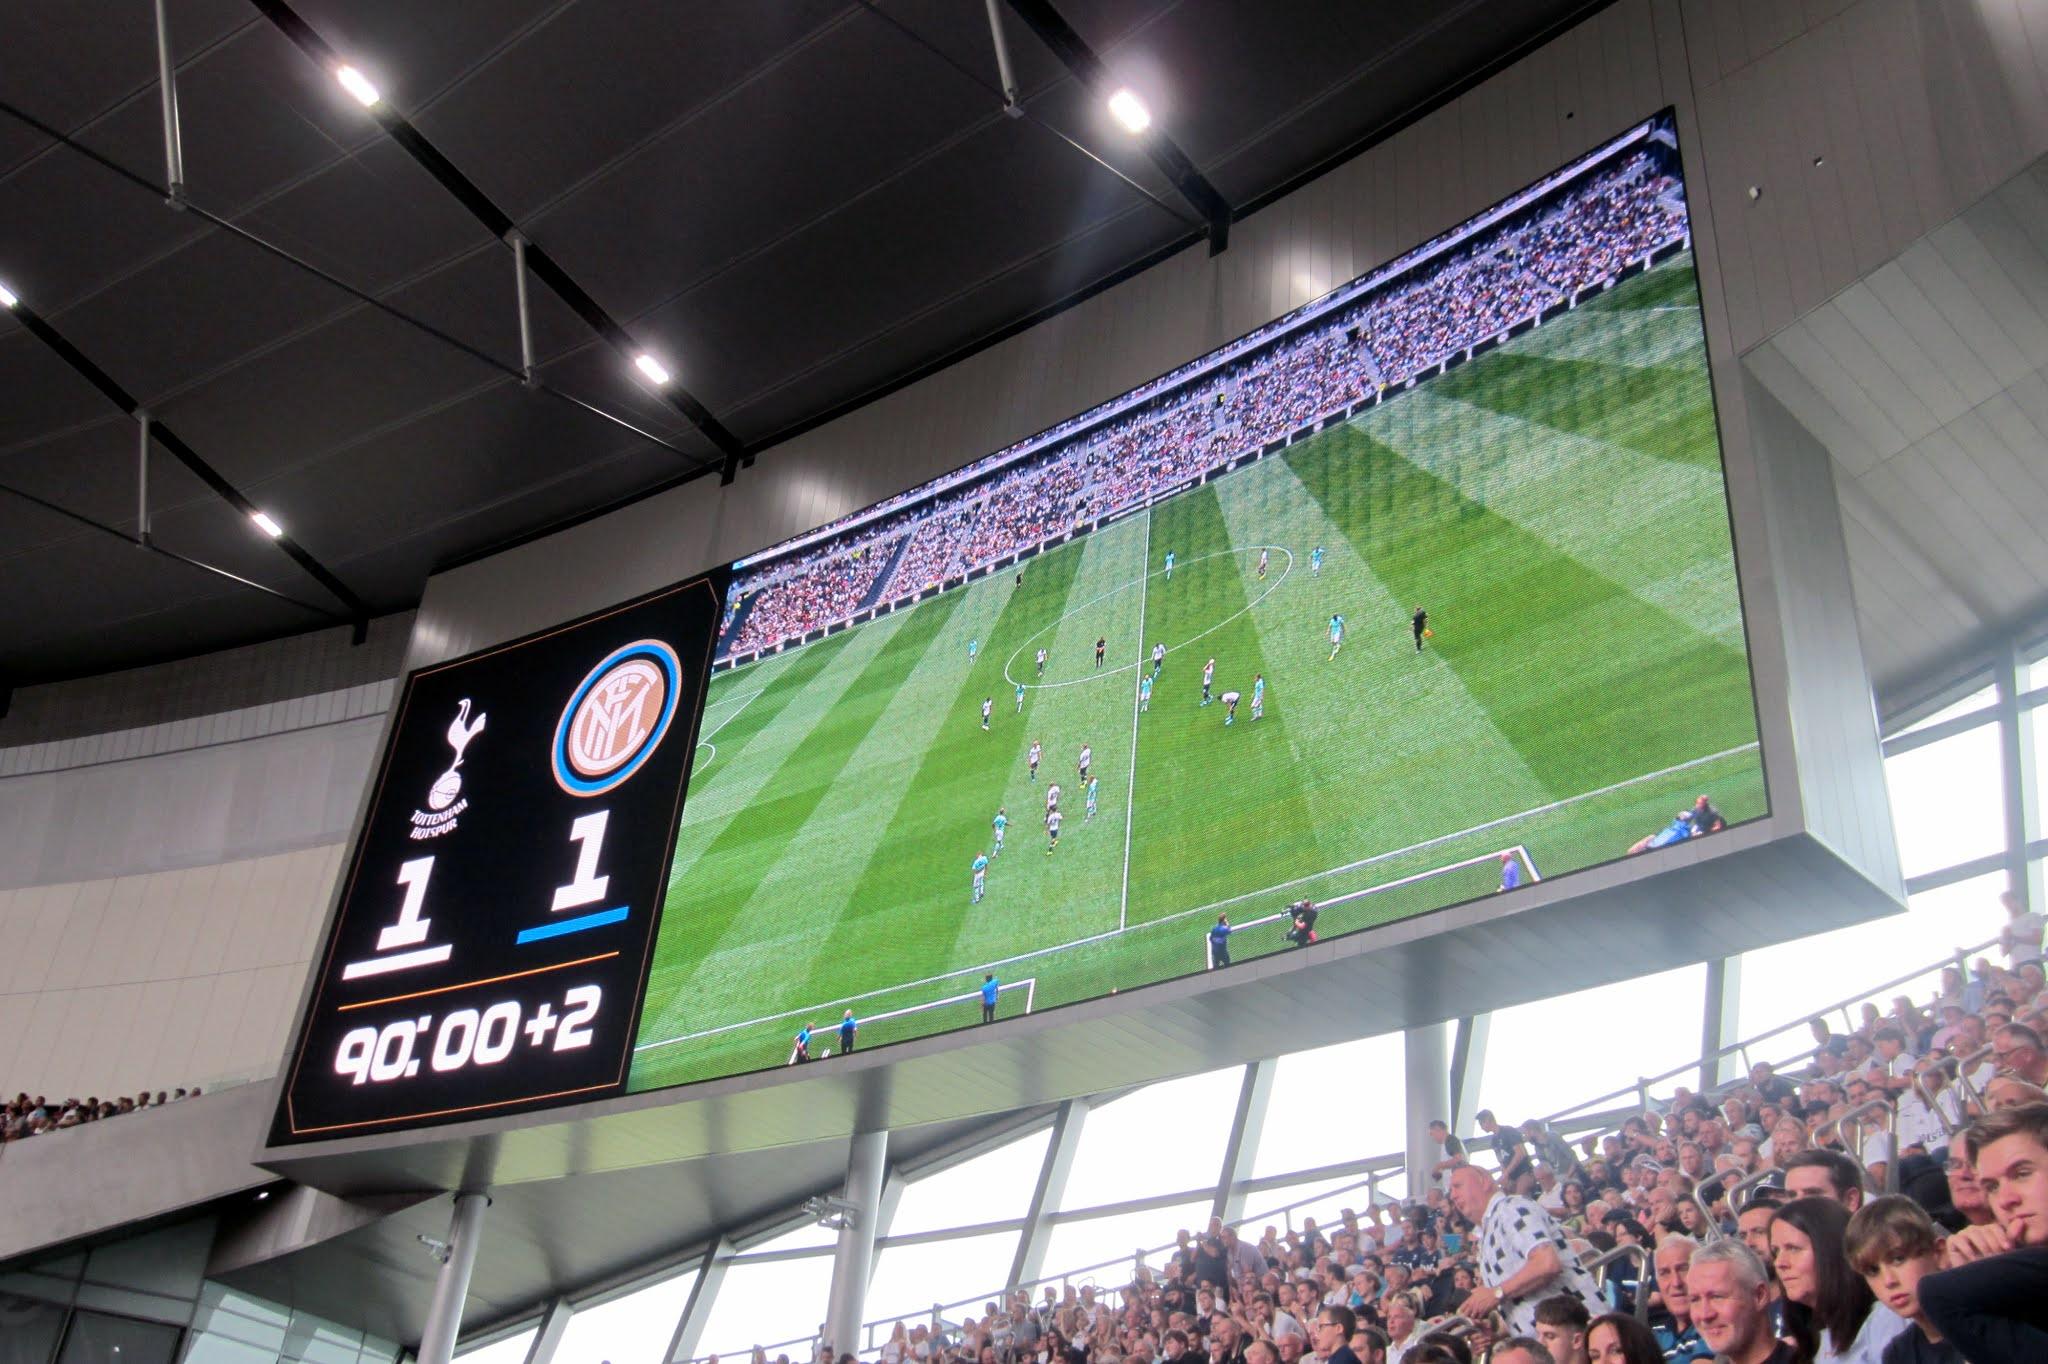 Video screen at Tottenham Hotspur Stadium